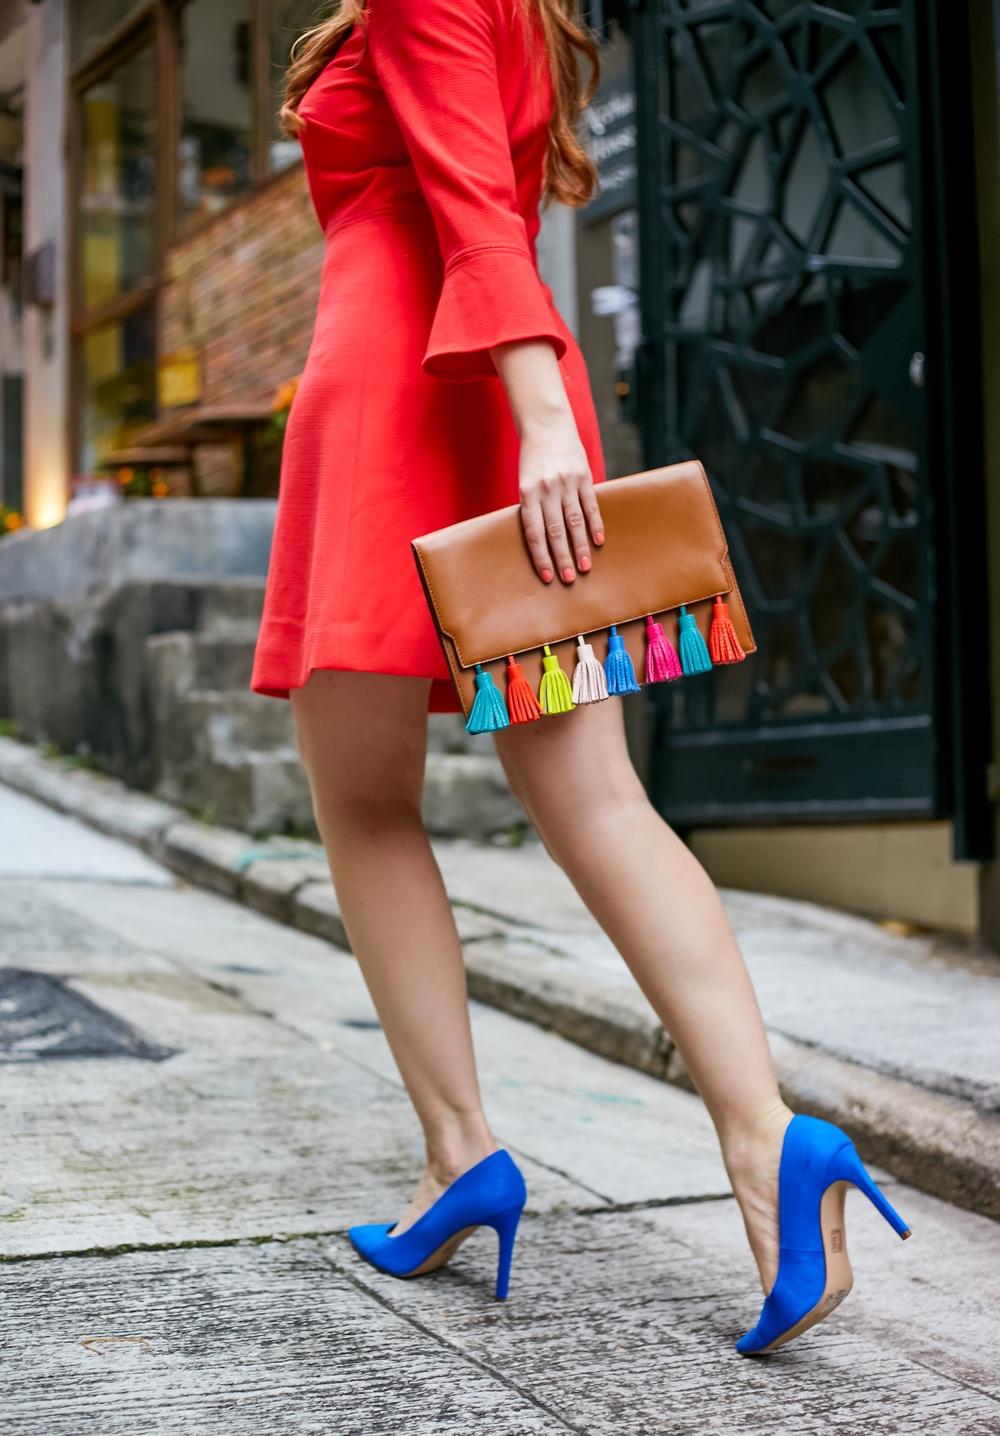 Rebecca Minkoff Colorful Tassel Bag, blue heels, red dress styling